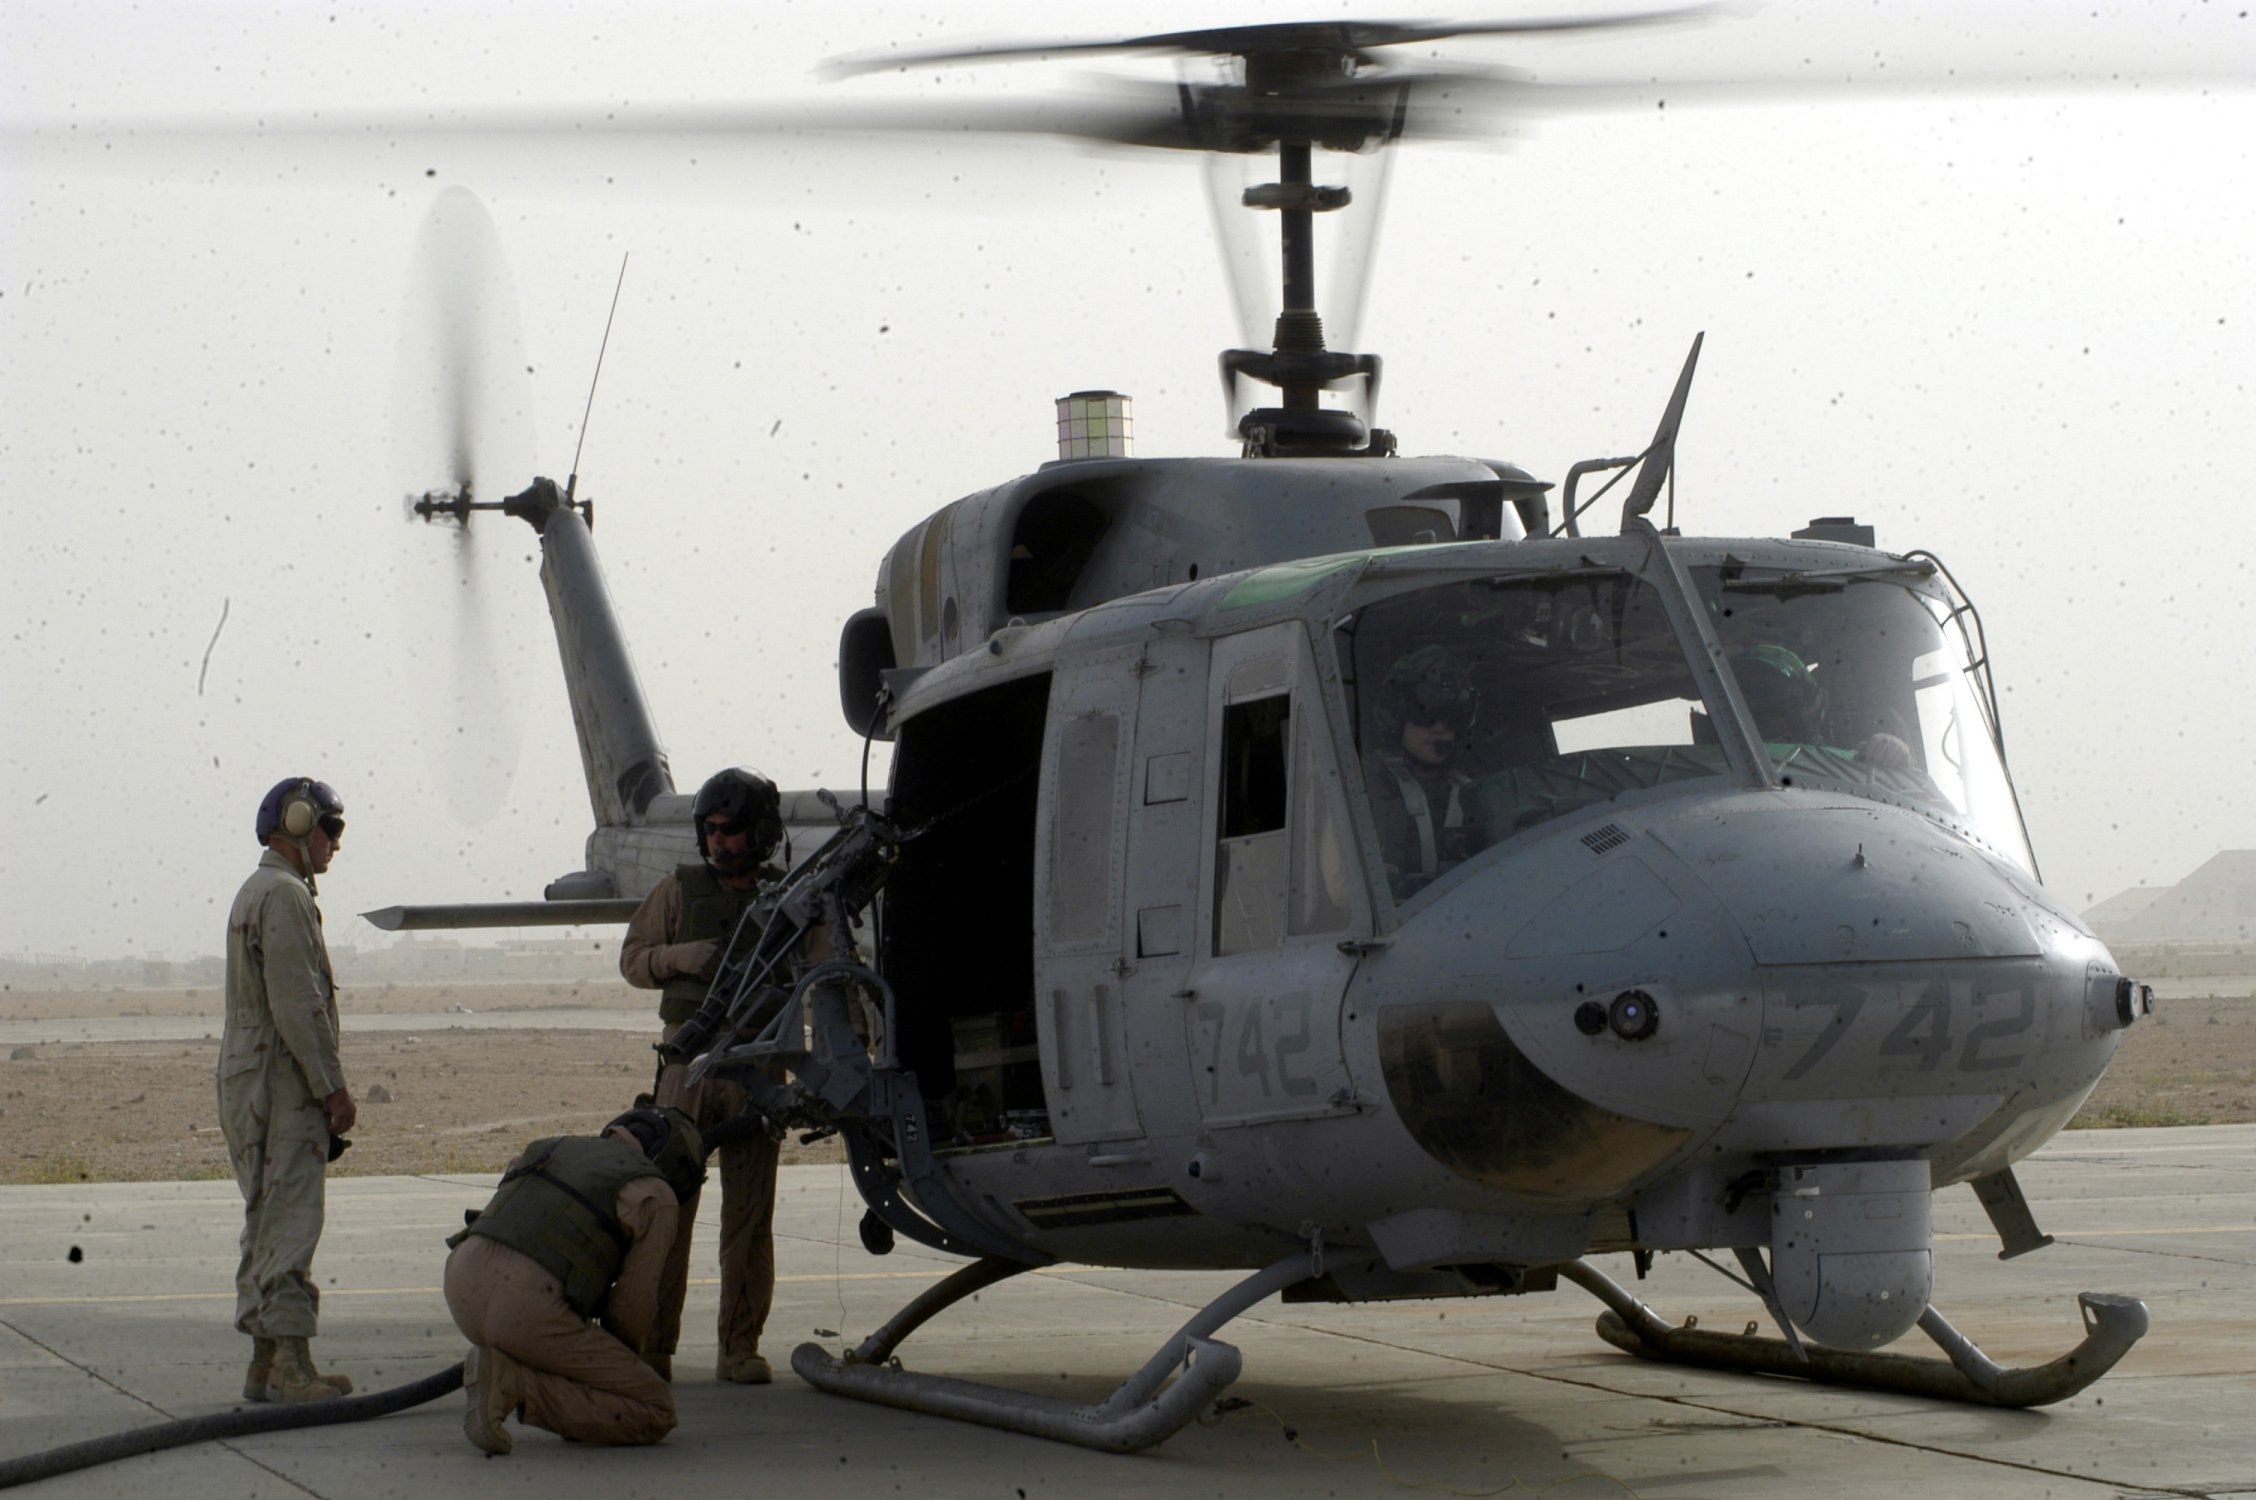 Elicottero Uh 1 : Vietnam huey engine free image for user